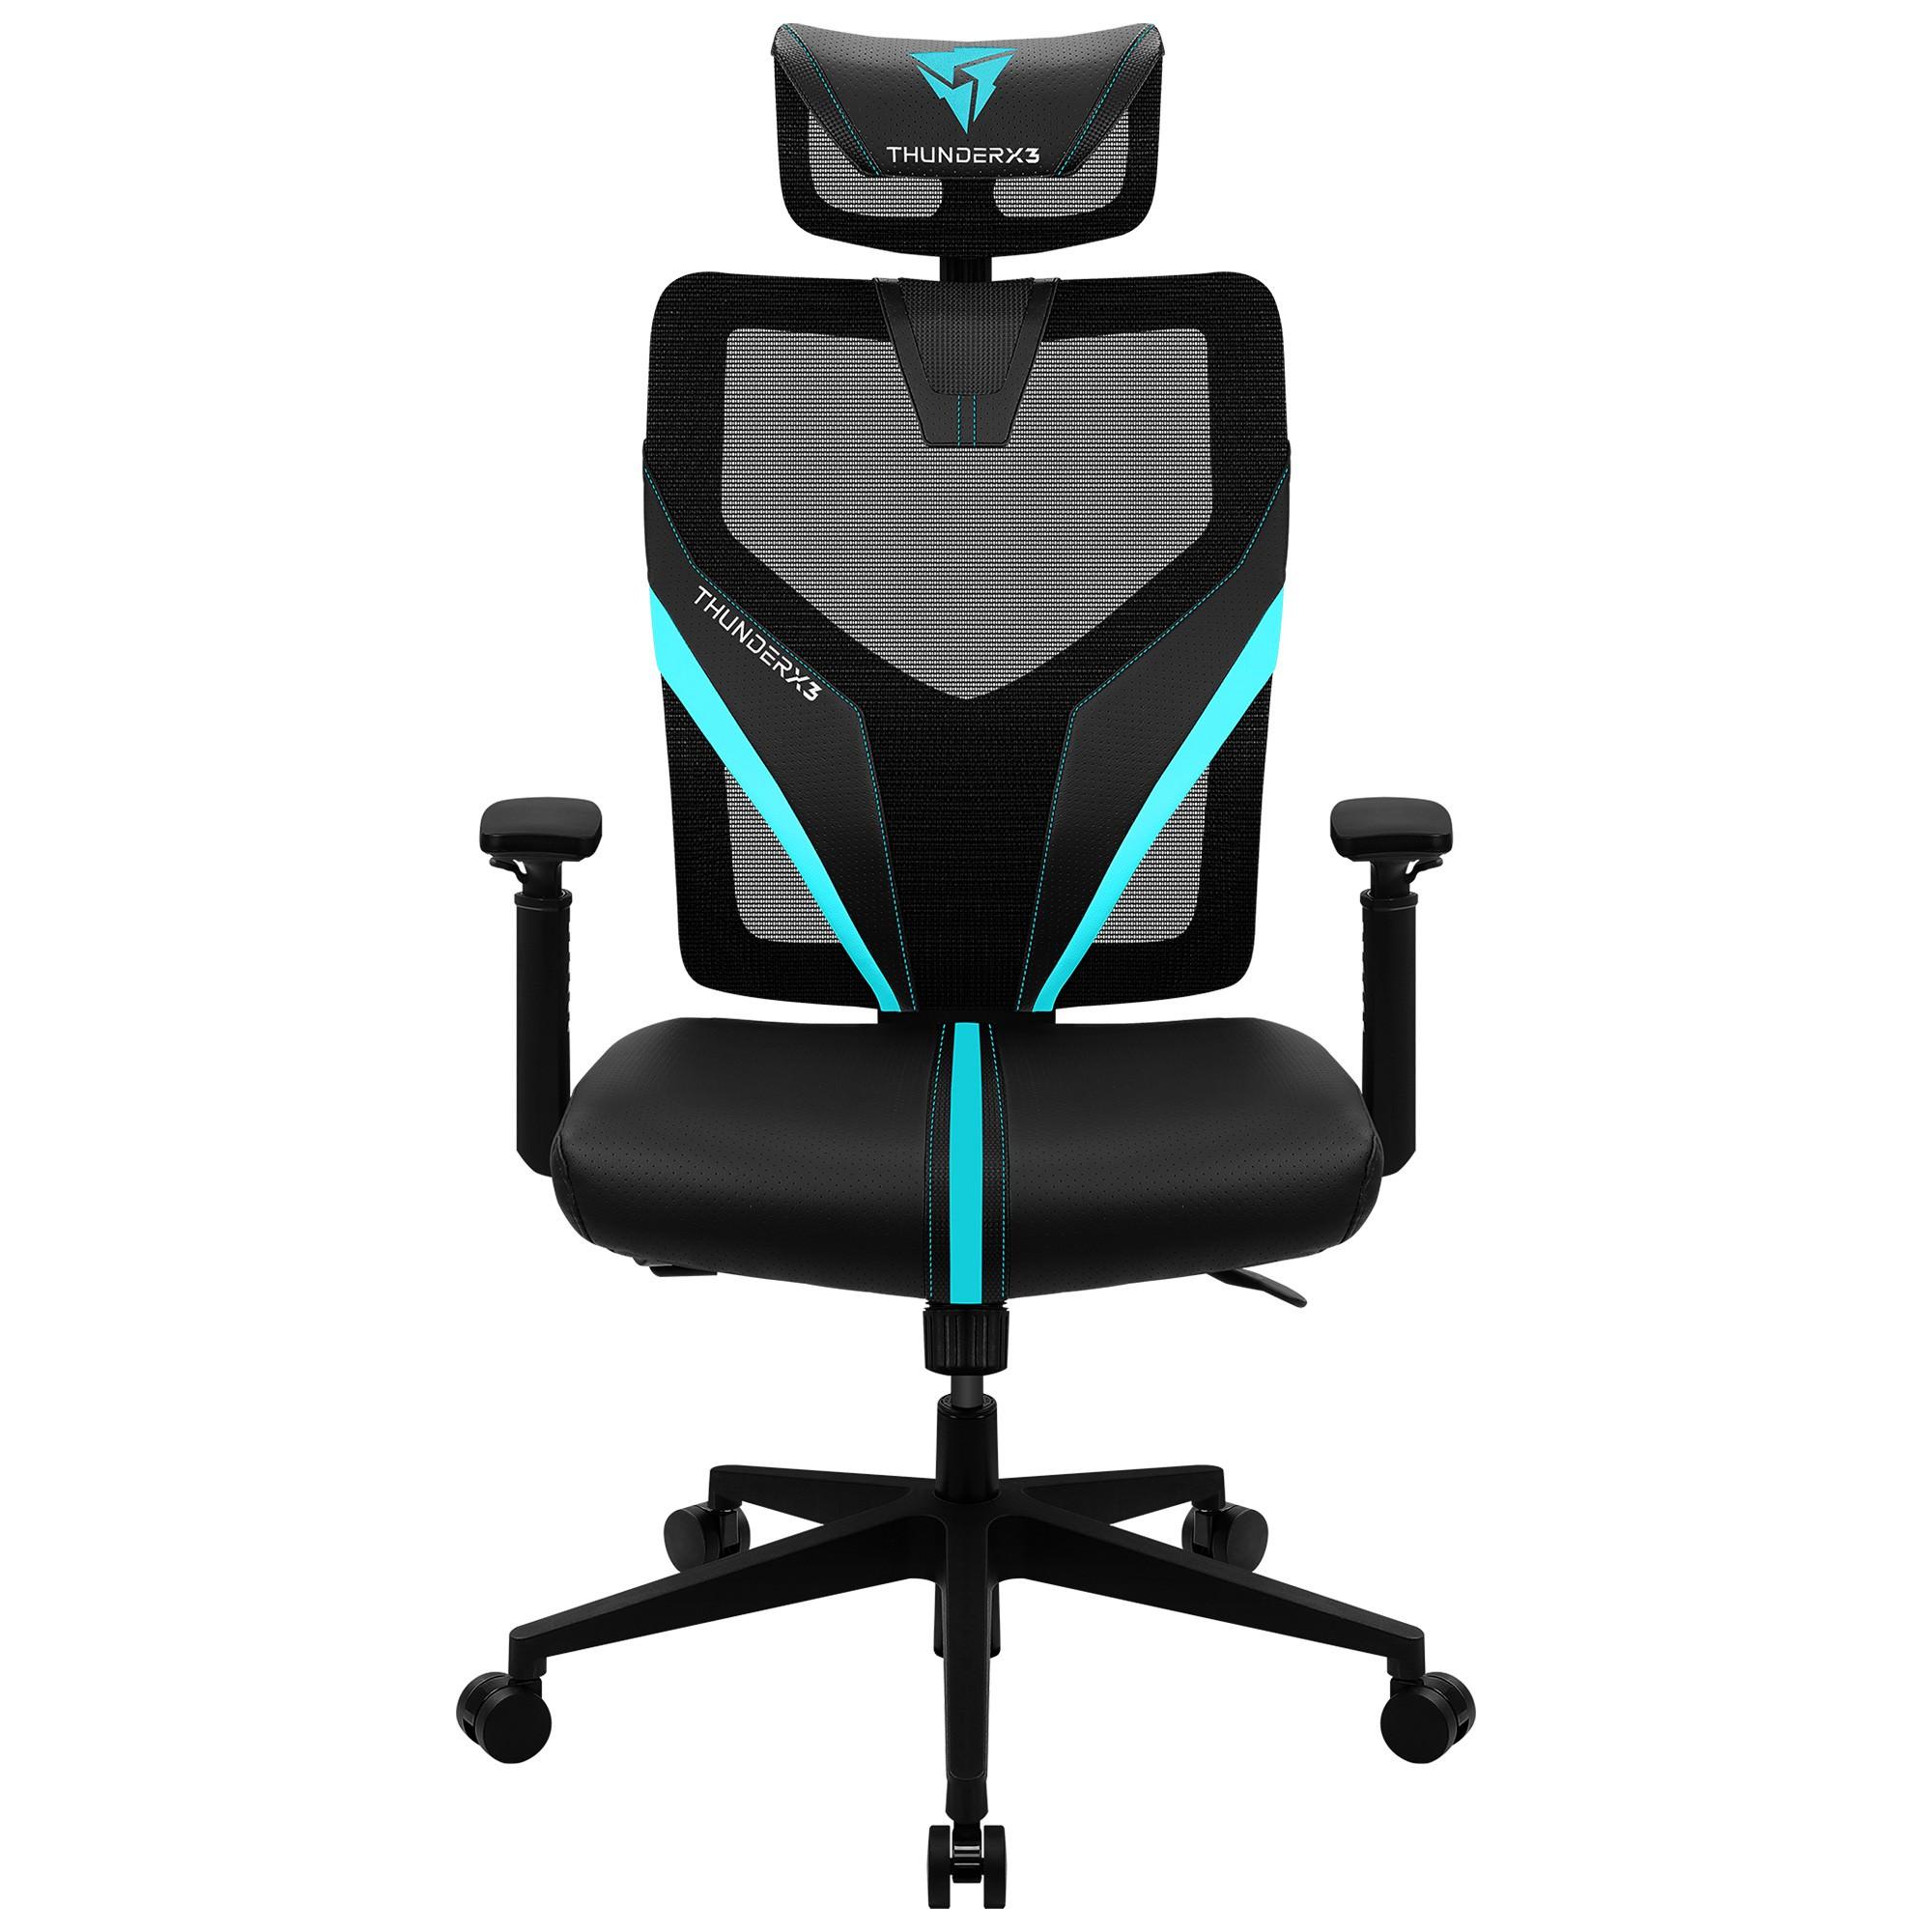 ThunderX3 YAMA1 Gaming Chair, Black / Cyan